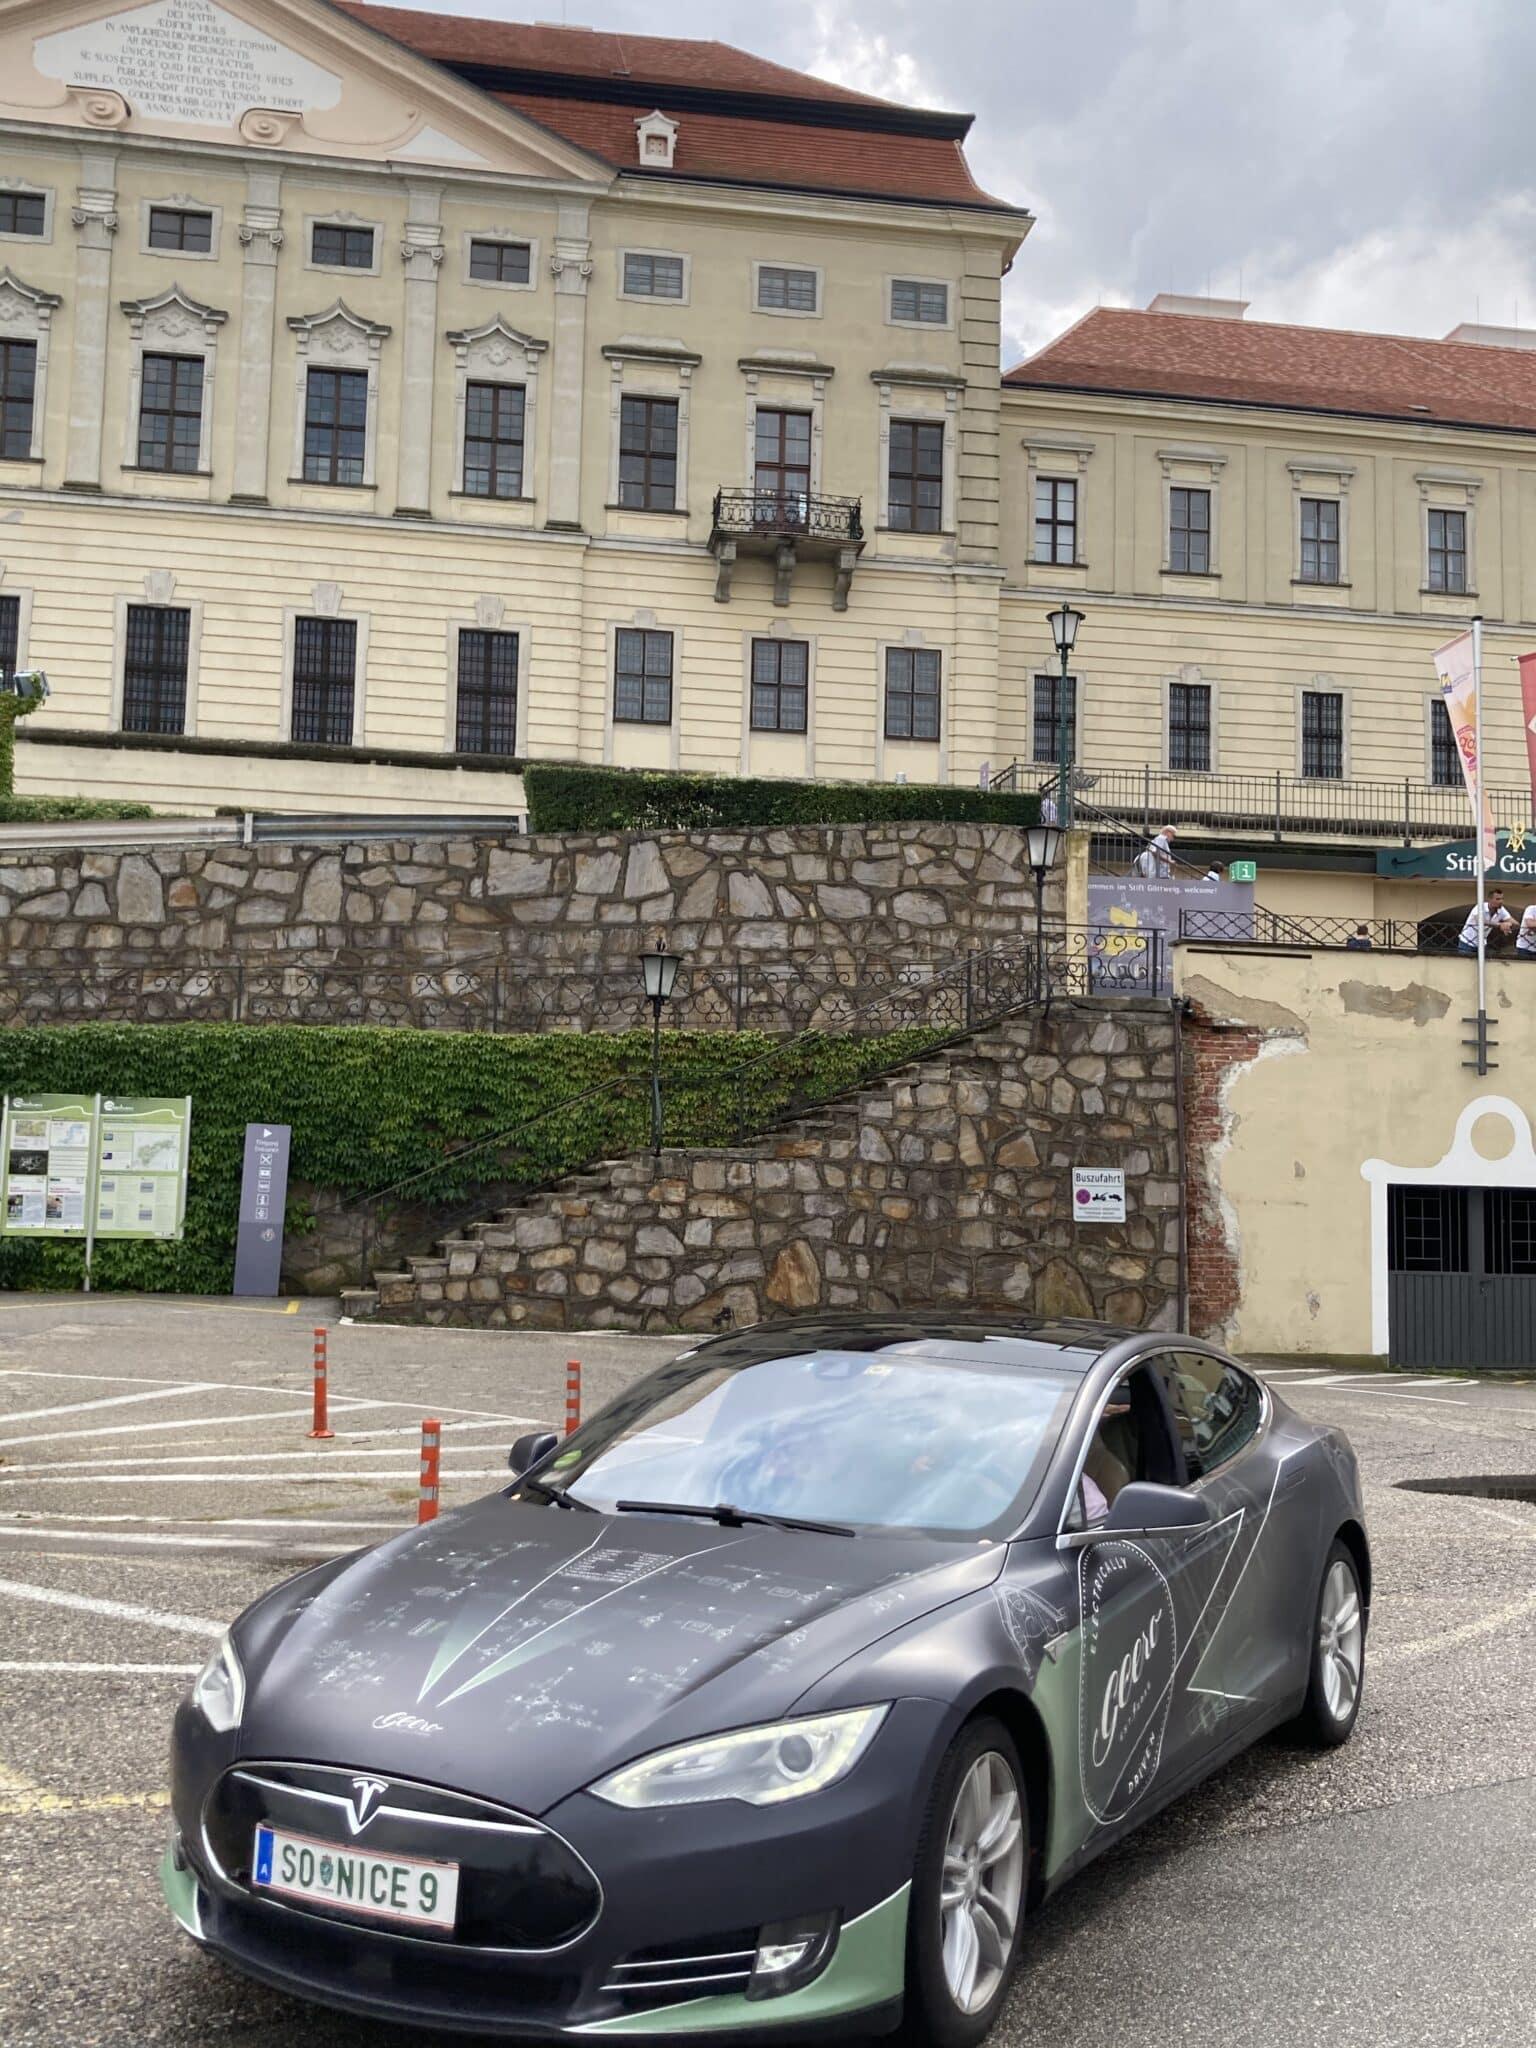 Das eMobility Sommerfest 2020 mit Rundfahrt in Krems | IMG 1455 scaled